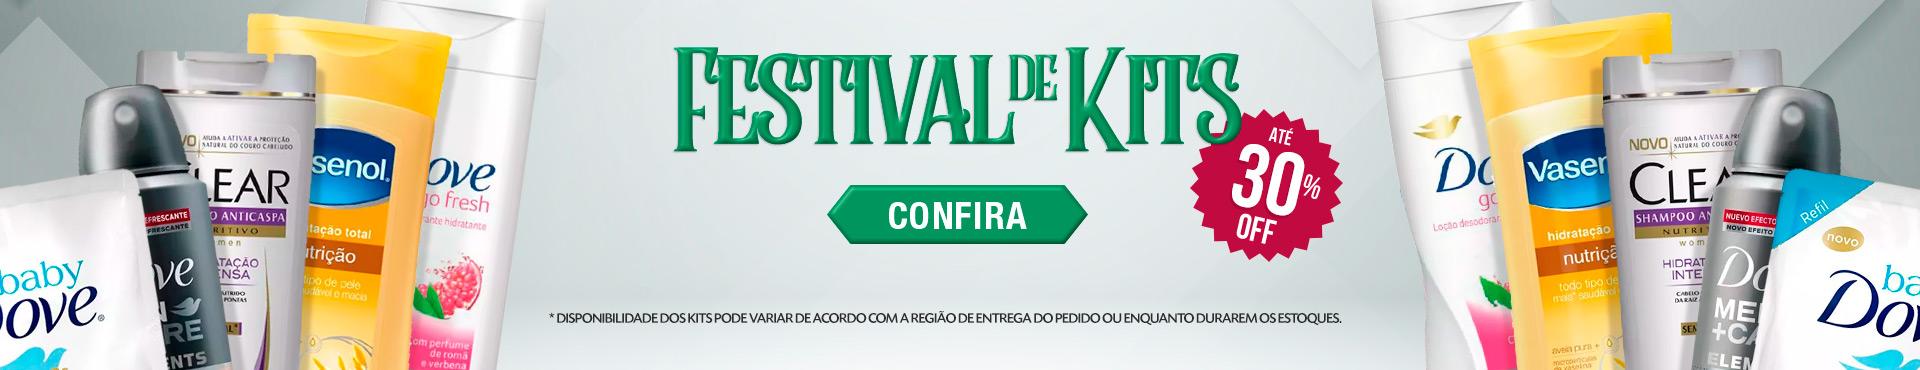 Festival de Kits